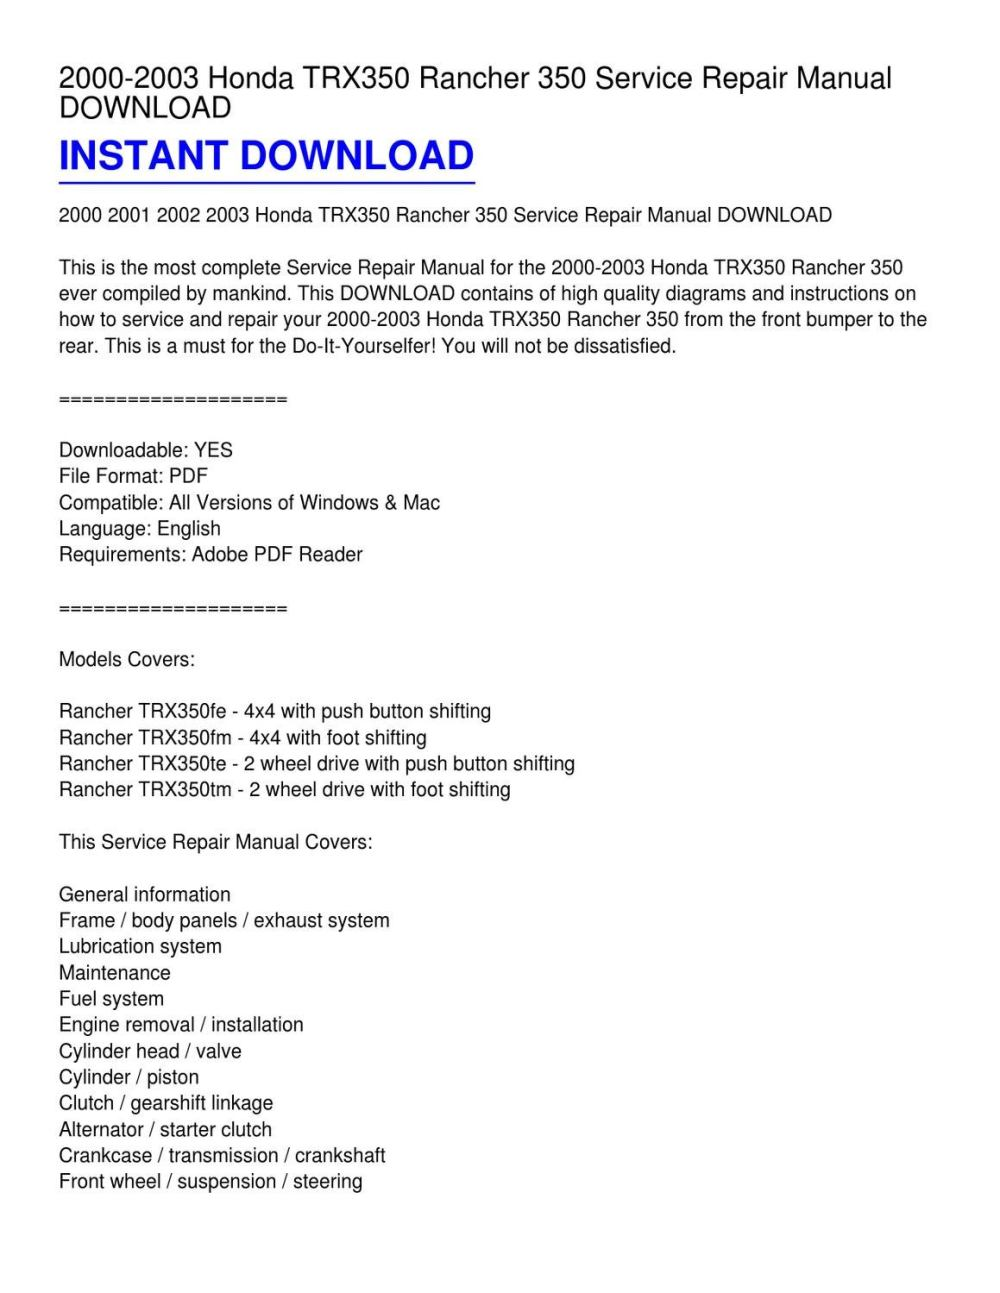 medium resolution of 2000 2003 honda trx350 rancher 350 service repair manual download from kevin fowler